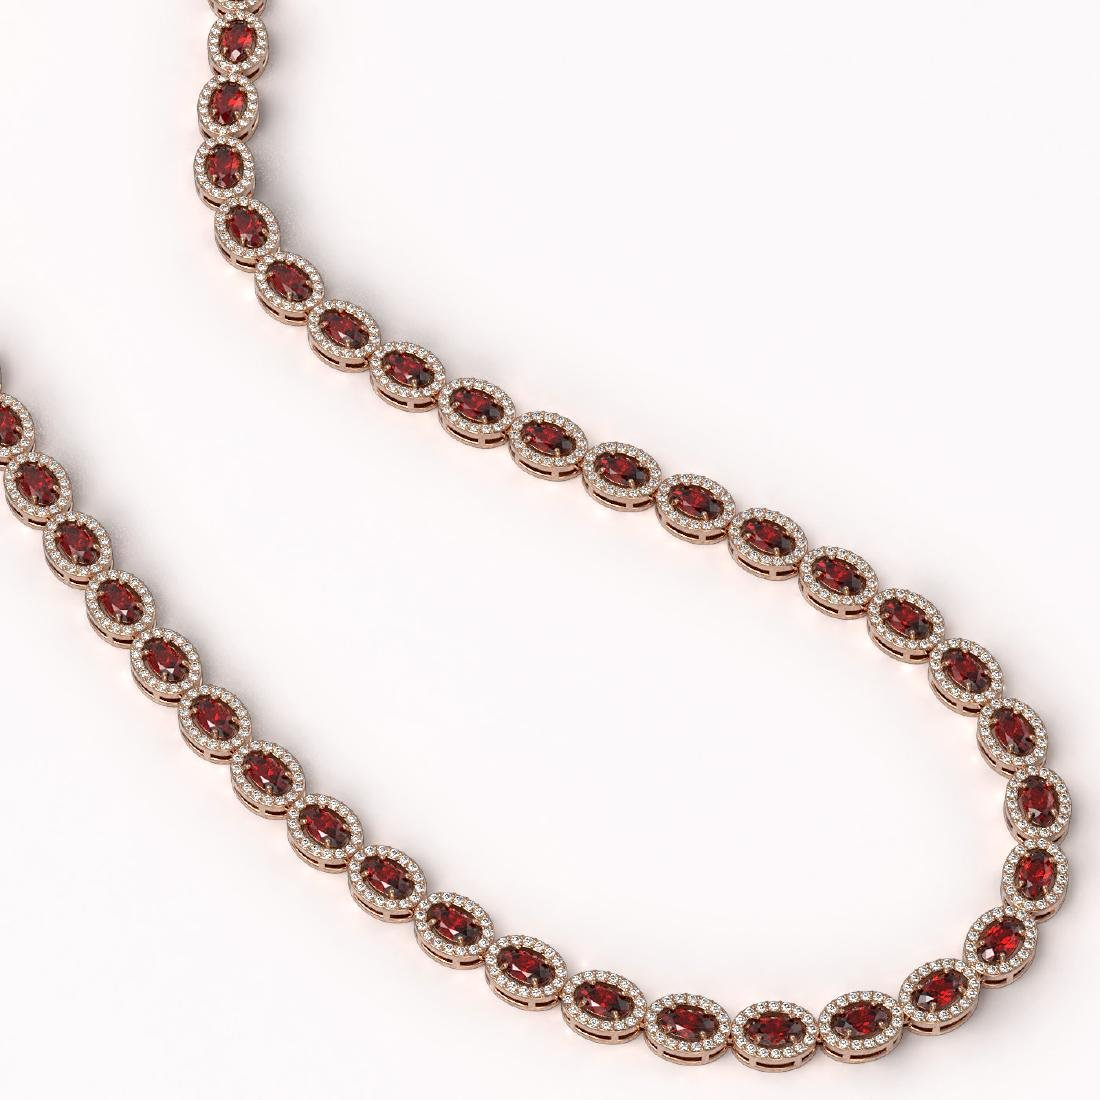 21.04 CTW Garnet & Diamond Halo Necklace 10K Rose Gold - 2